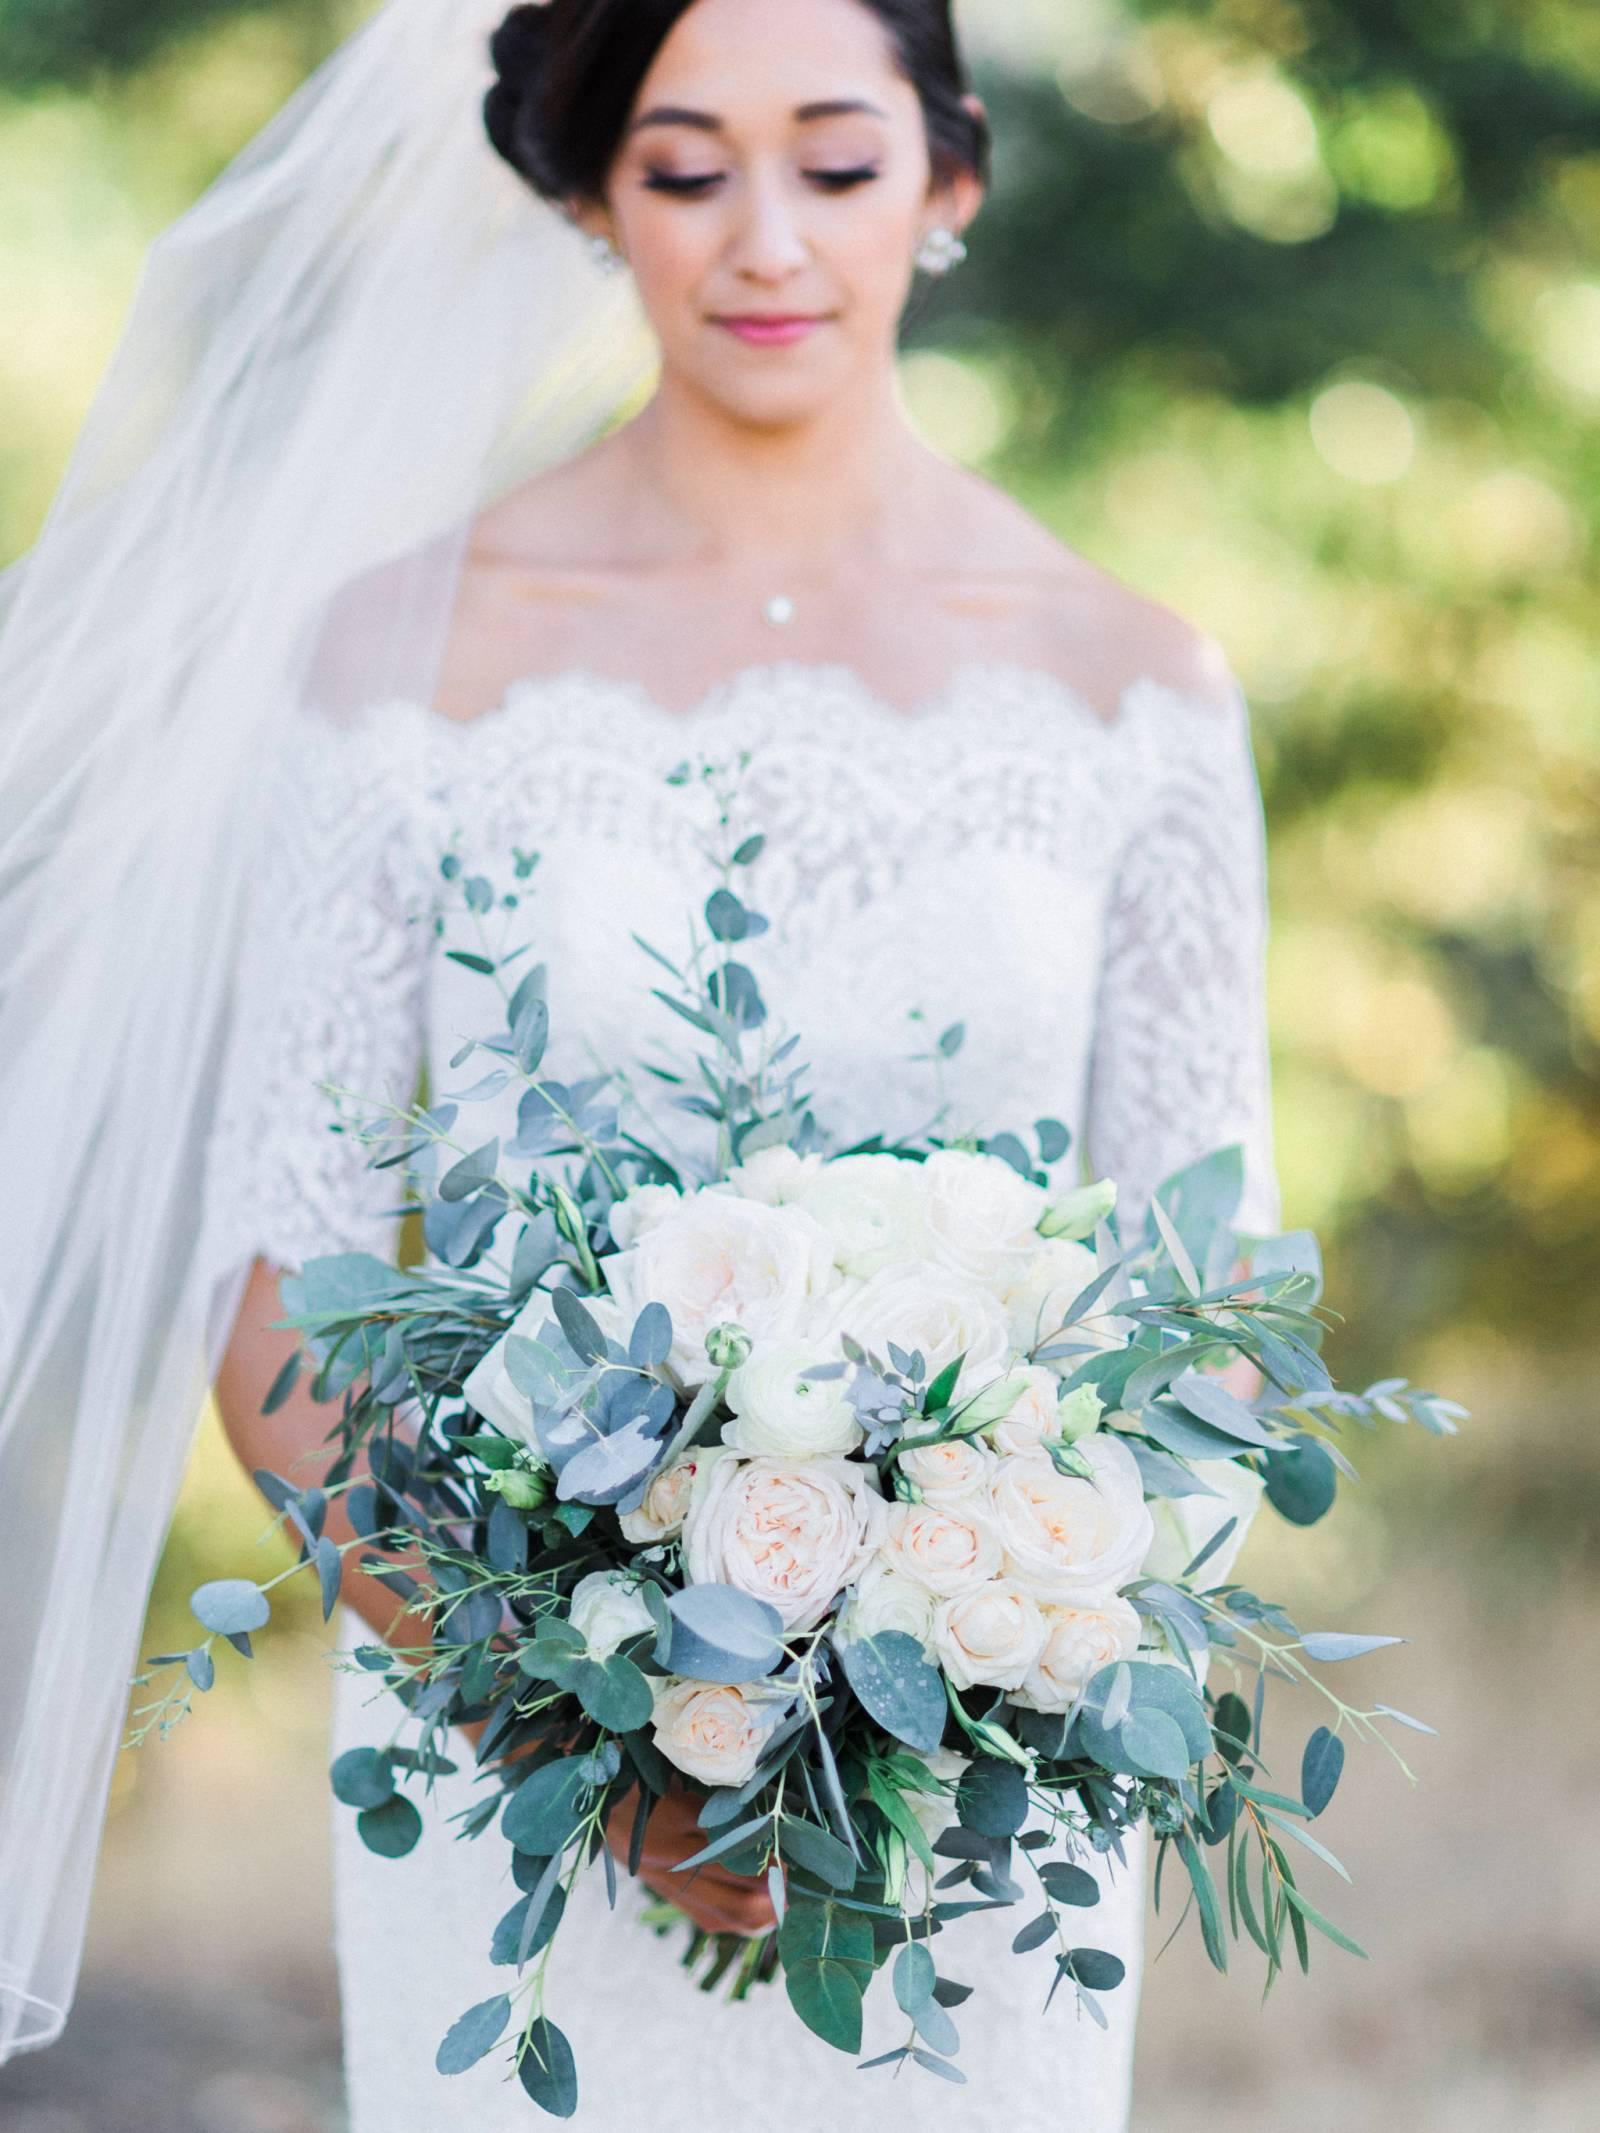 Magnificent Borrow A Wedding Dress Photos - Wedding Ideas ...